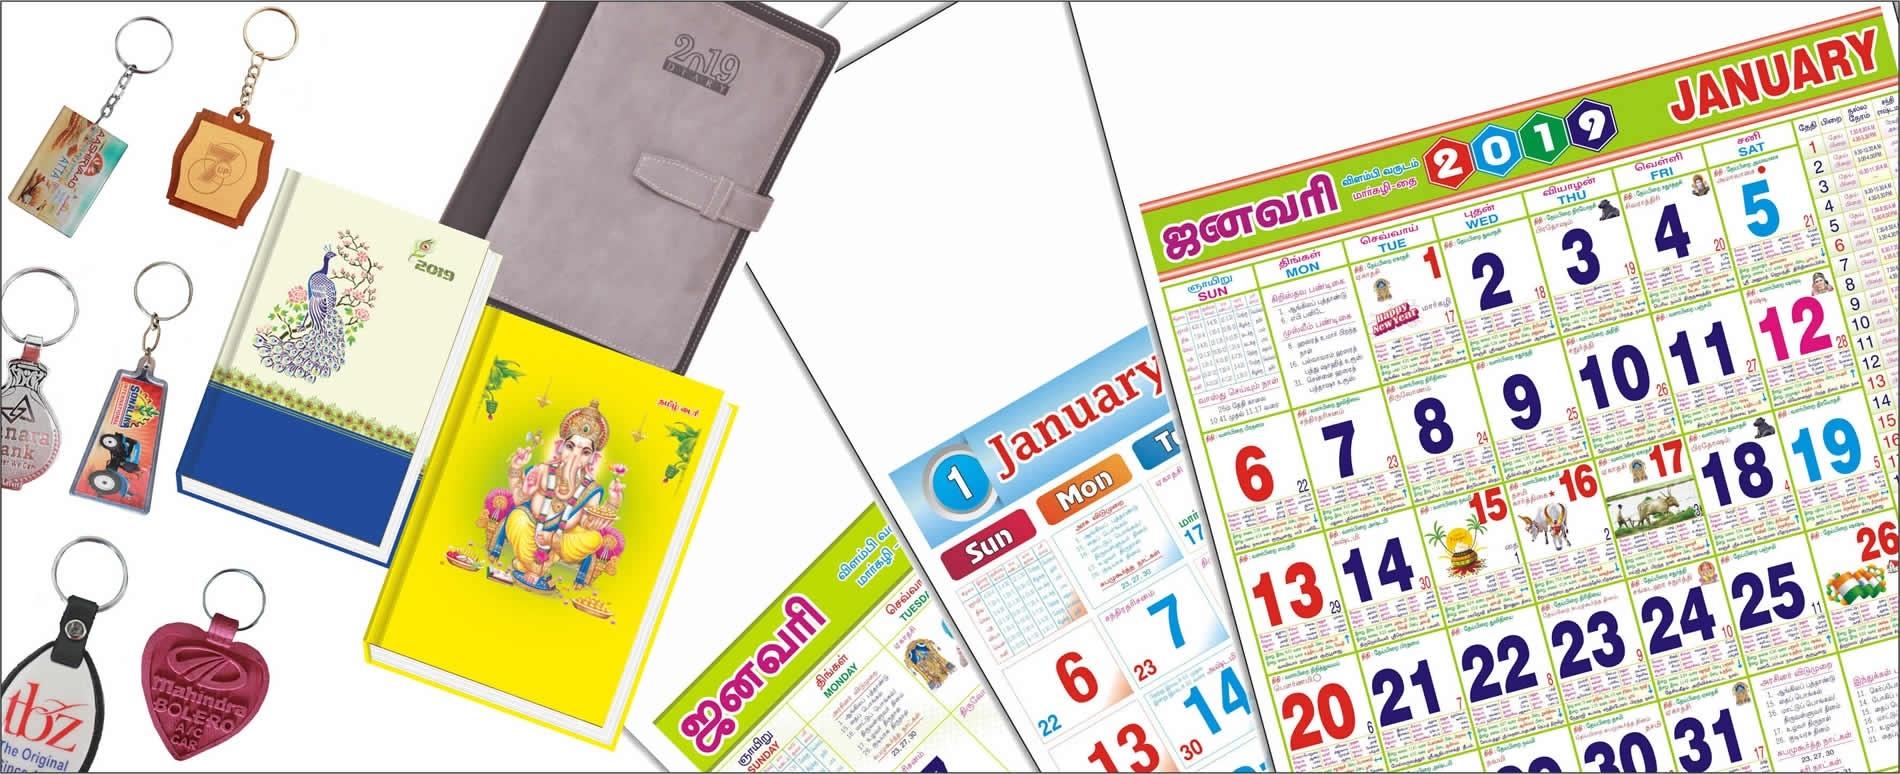 Sibhu Prints - Monthly Calendar, Offset Printing, Keychain_Calendar 2019 Printing Sivakasi